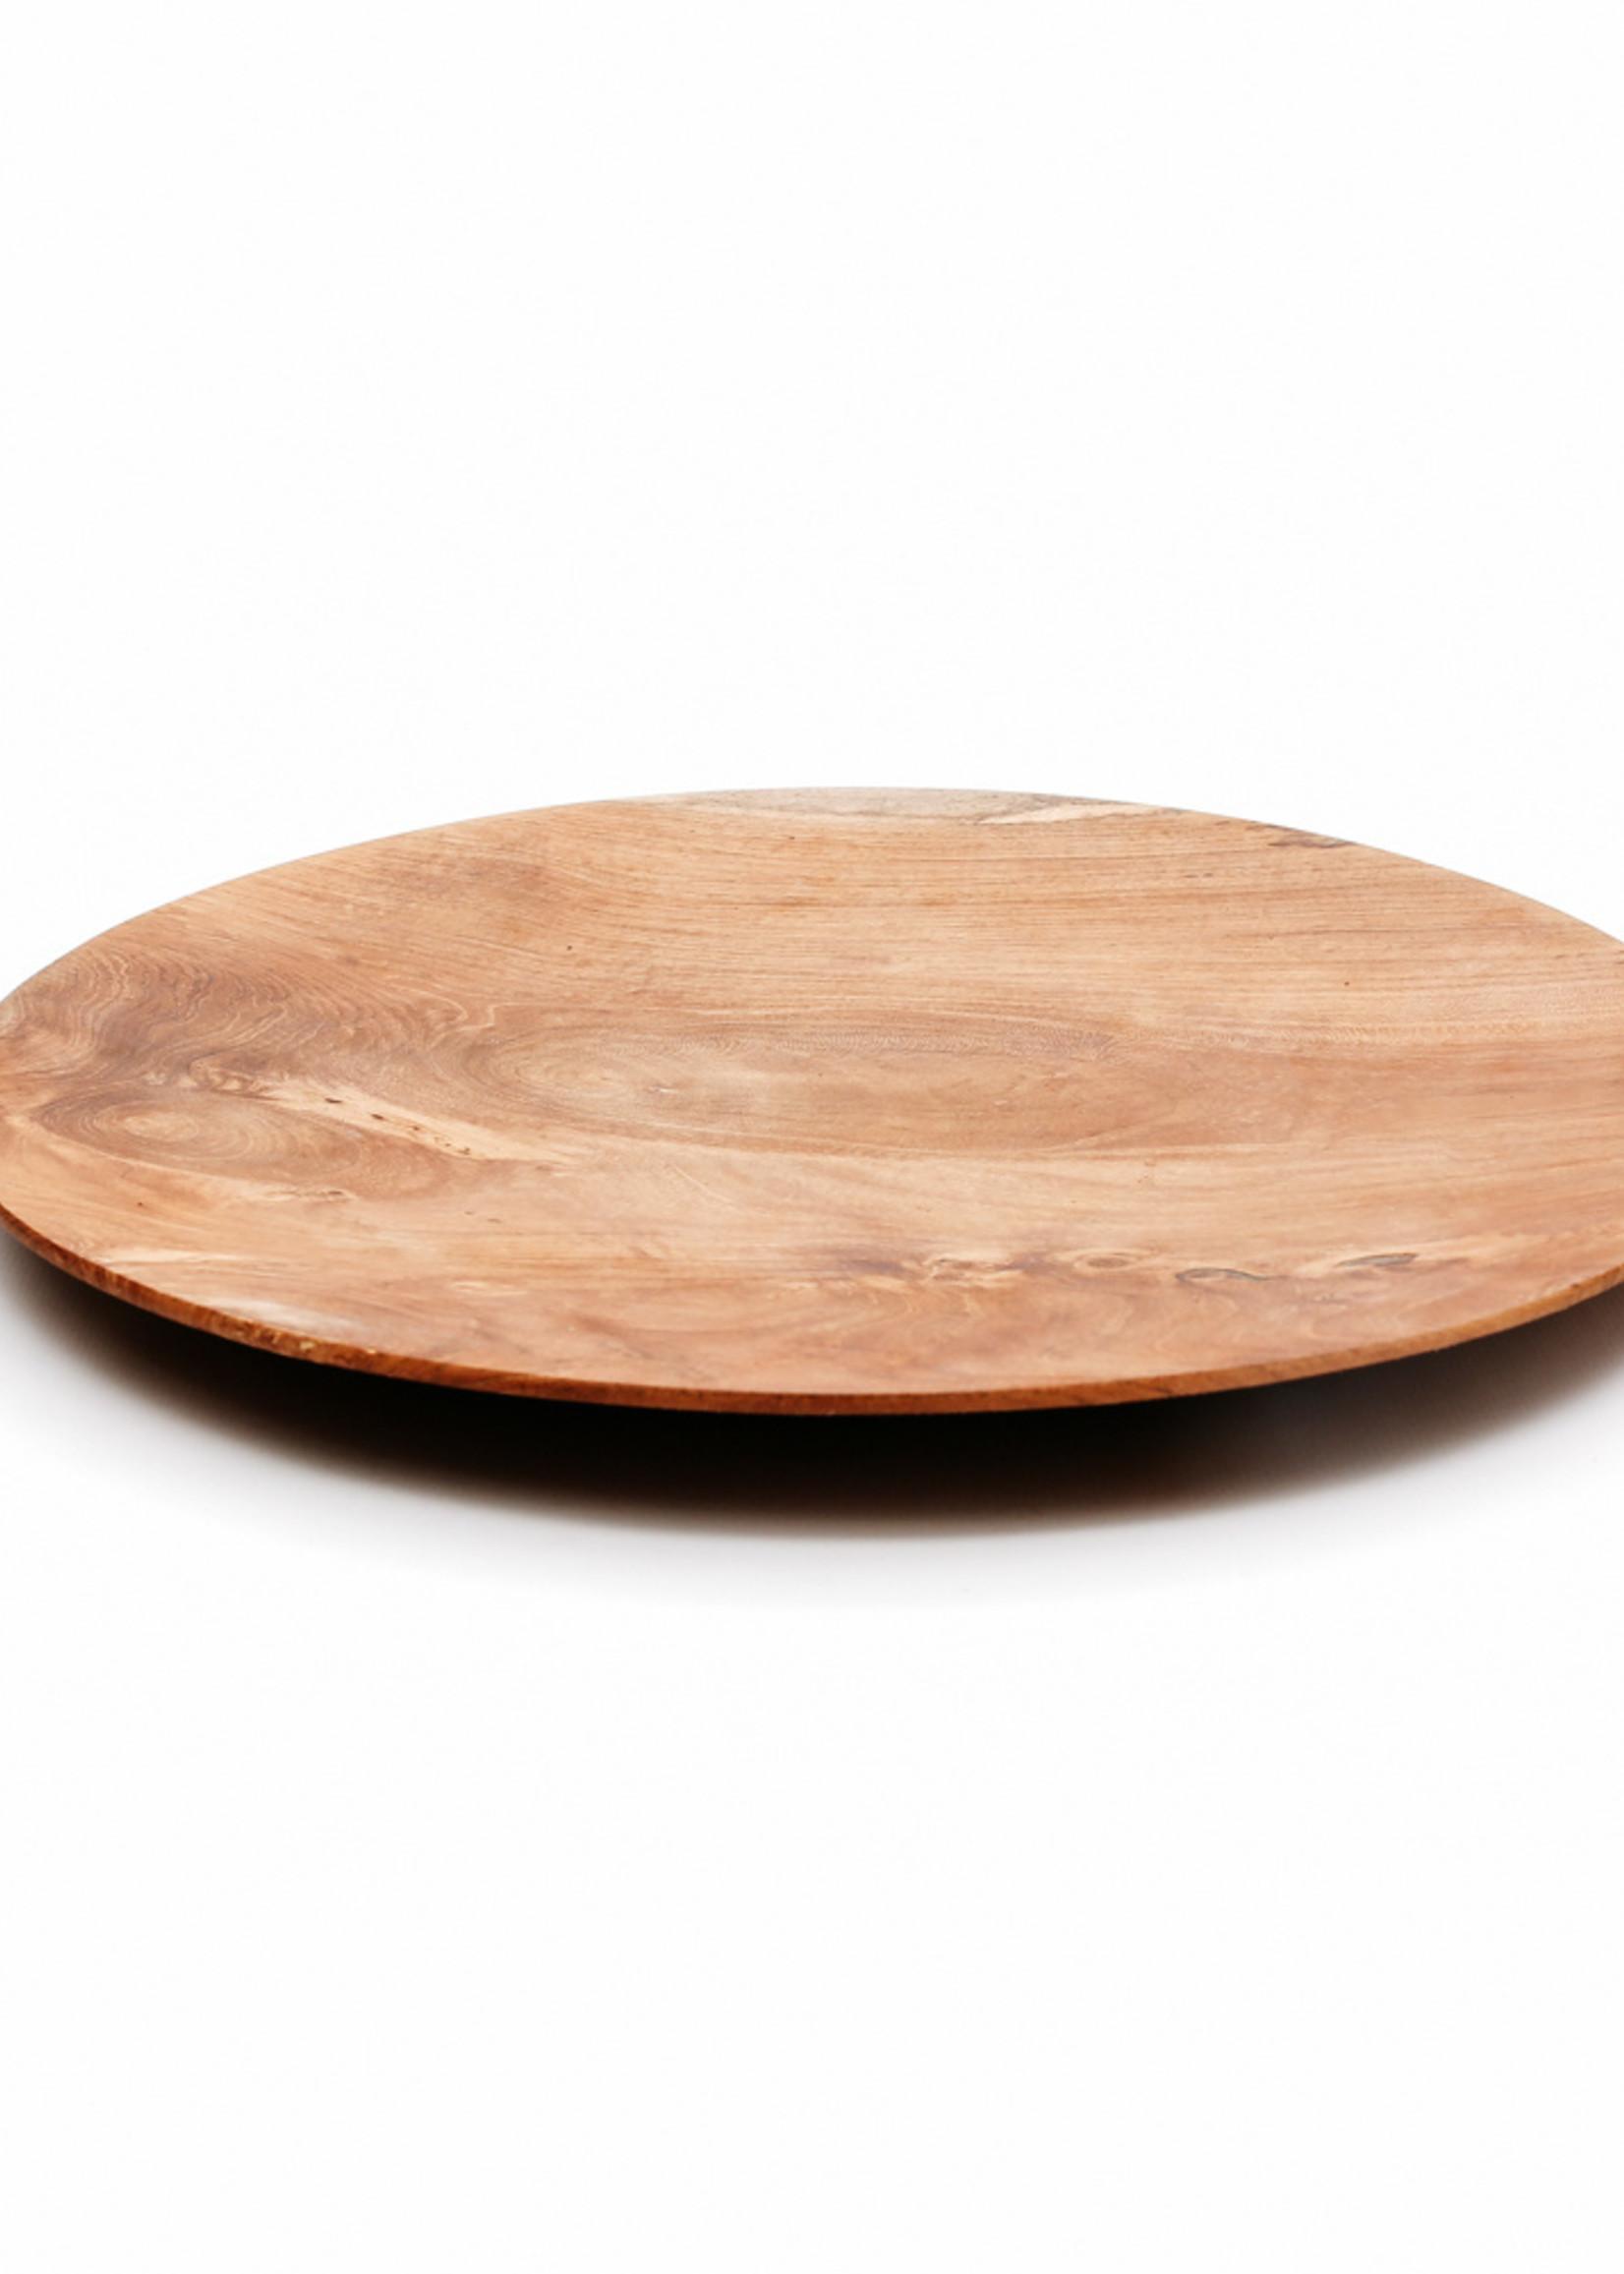 The Teak Root Round Plate - M